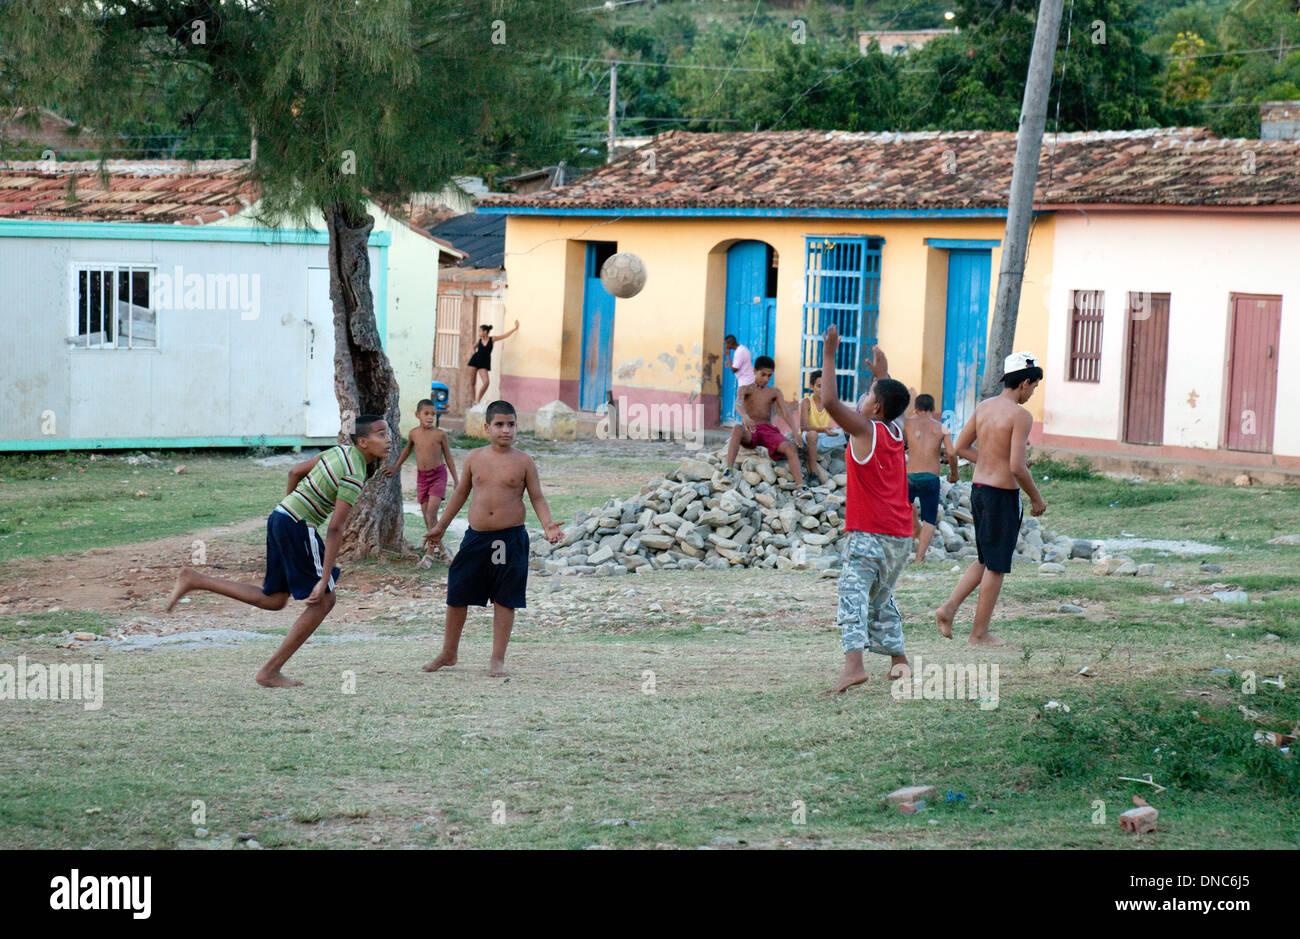 Children Playing Football Soccer Trinidad Cuba Caribbean Latin America